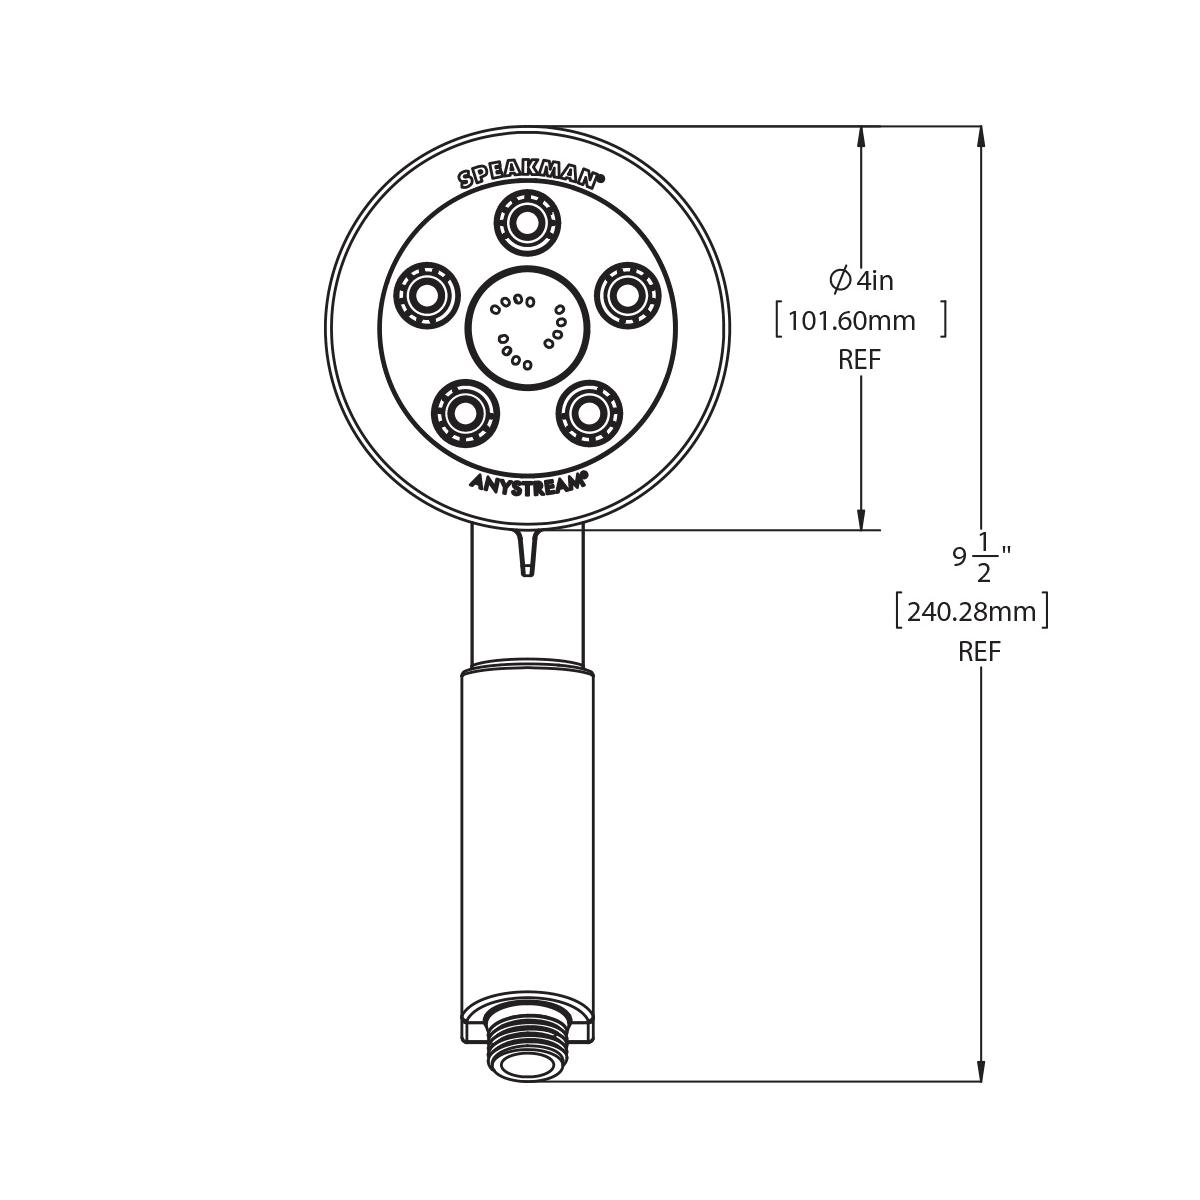 Speakman VS-3010-E175 Neo 1.75 GPM Multi Function Hand Shower